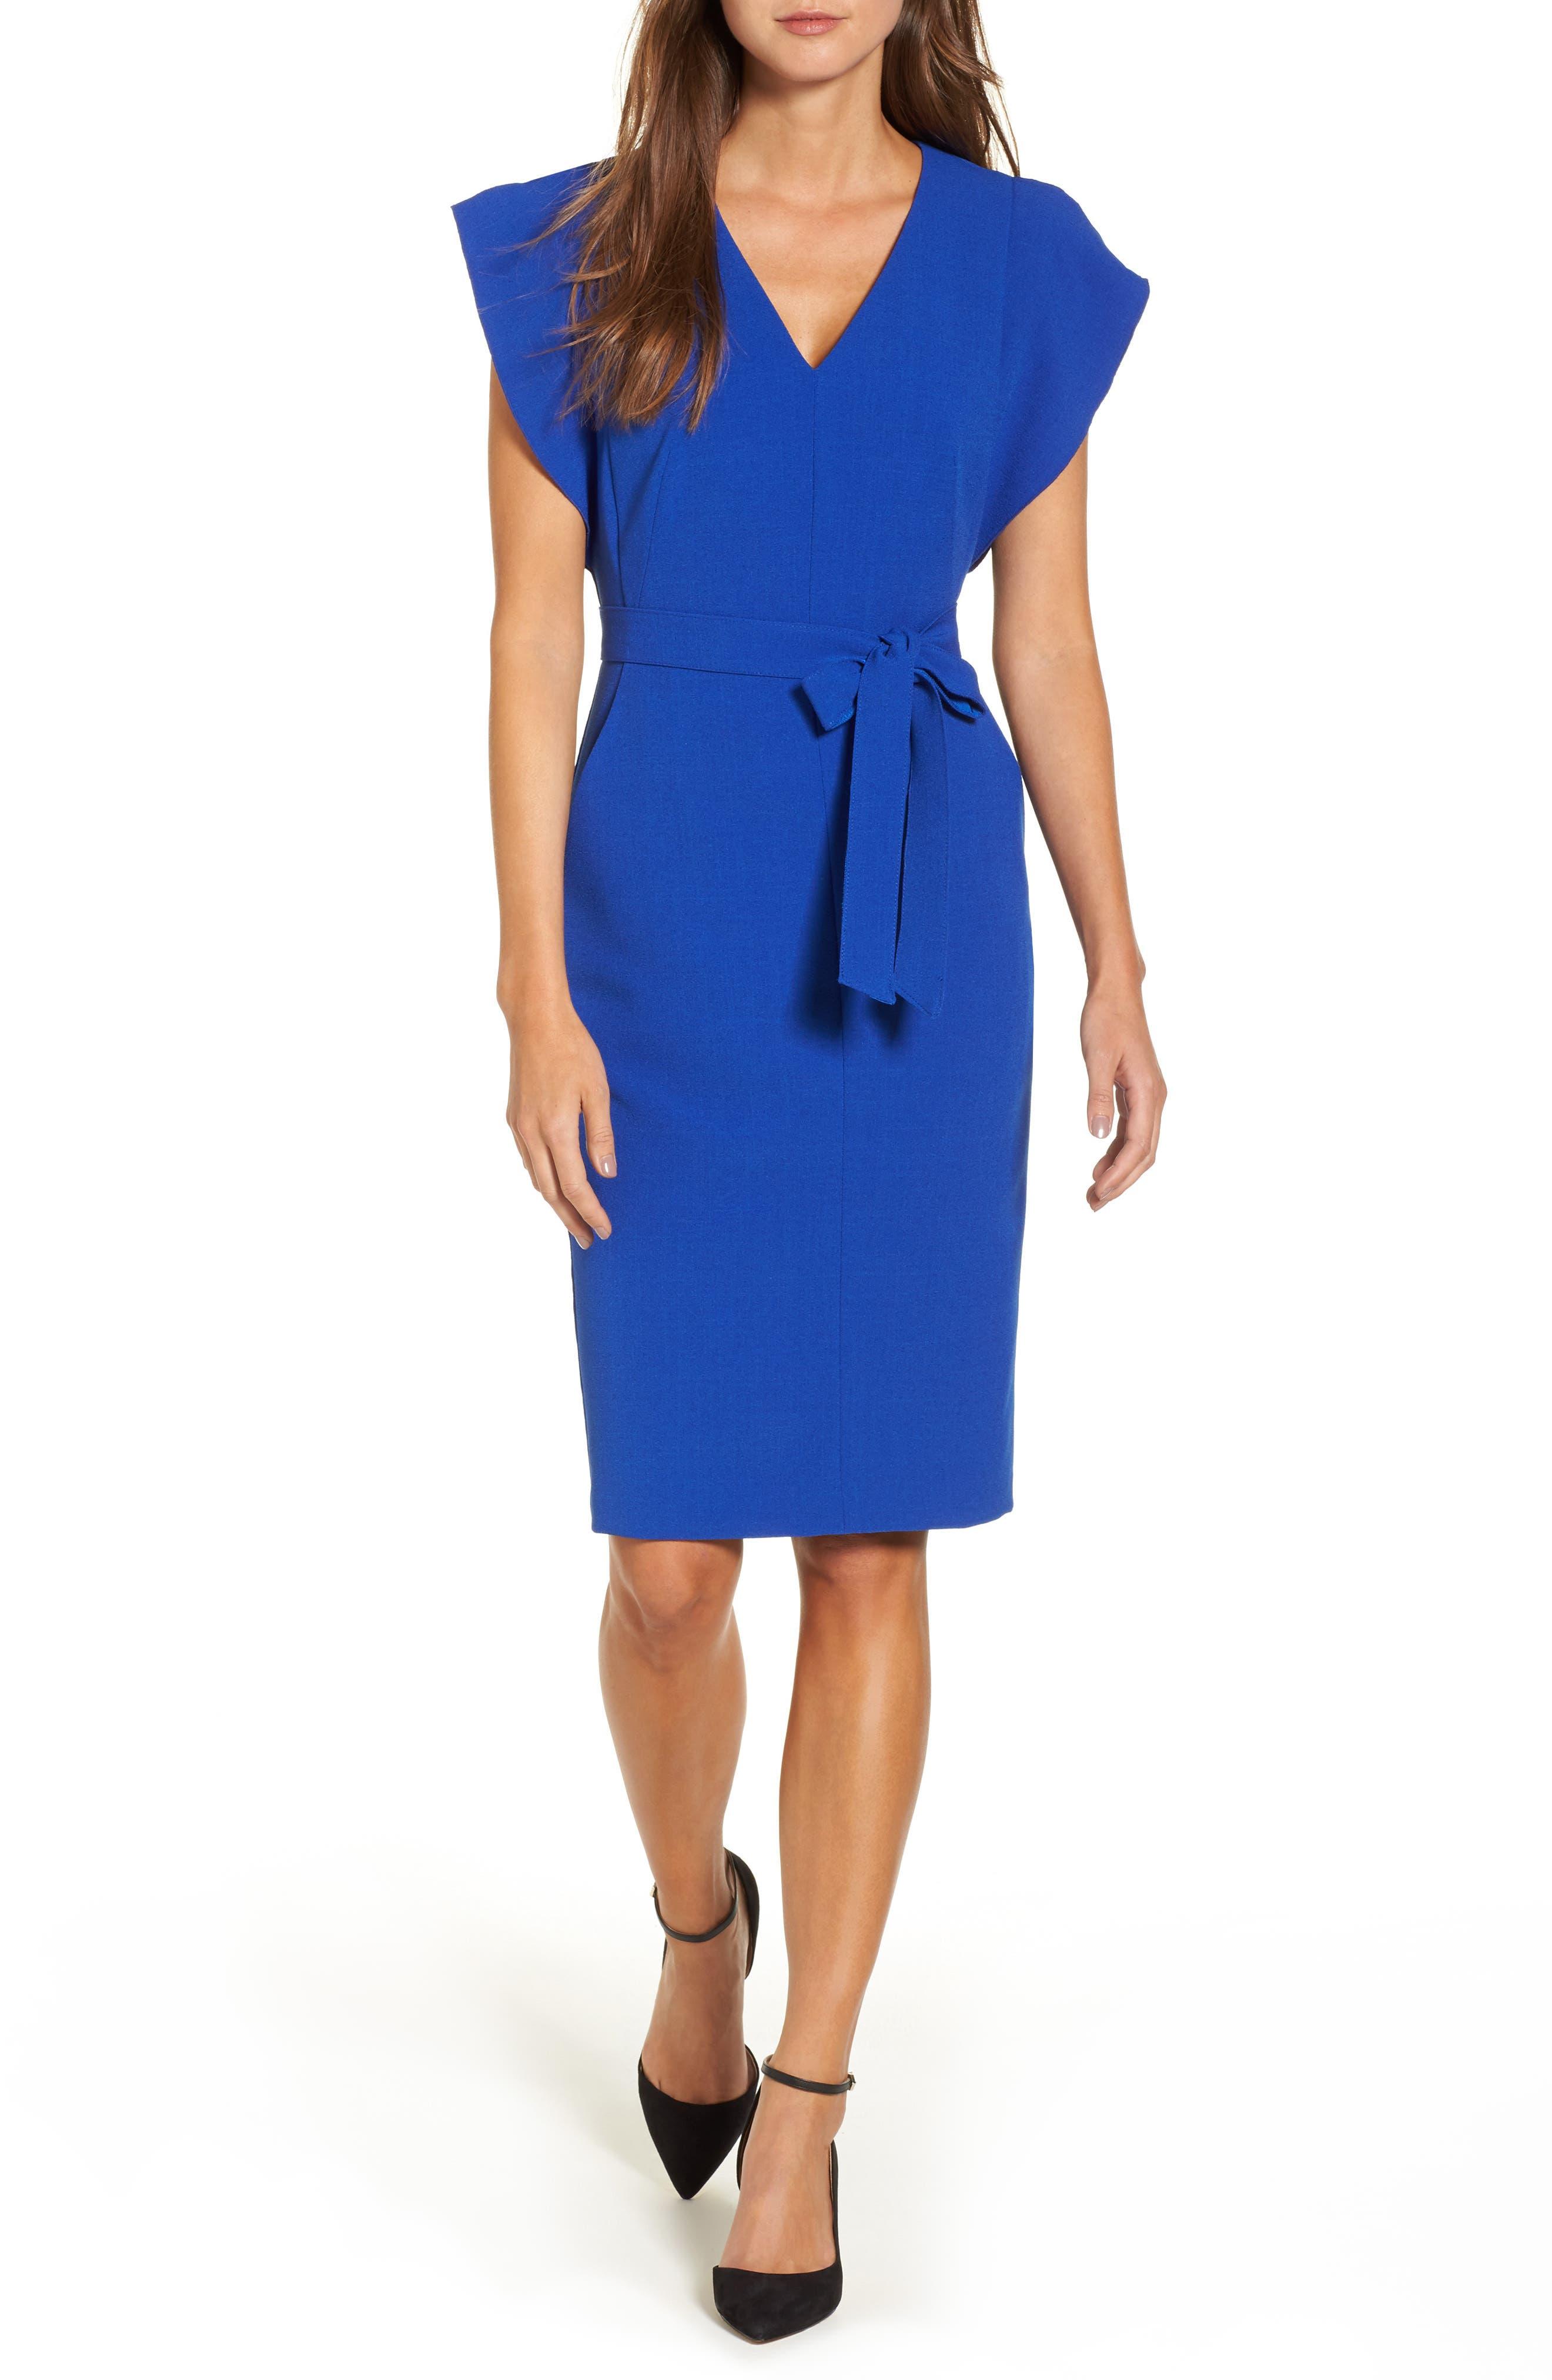 Alternate Image 1 Selected - Eliza J Ruffle Sleeve Sheath Dress